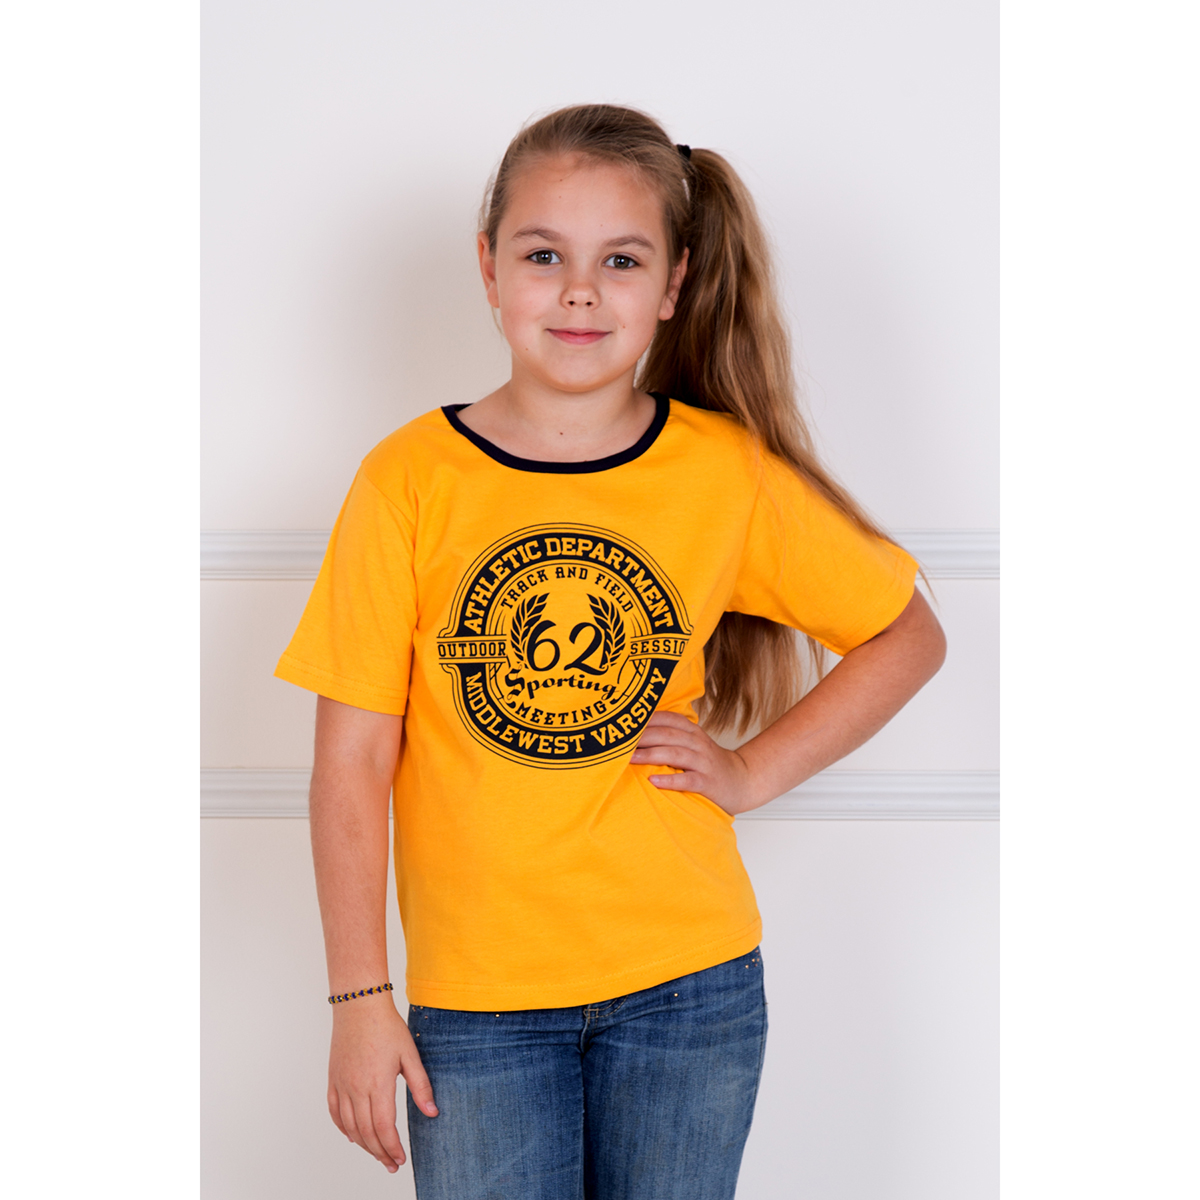 Детская футболка Камелот Желтый, размер 28Майки и футболки<br><br><br>Тип: Дет. футболка<br>Размер: 28<br>Материал: Кулирка